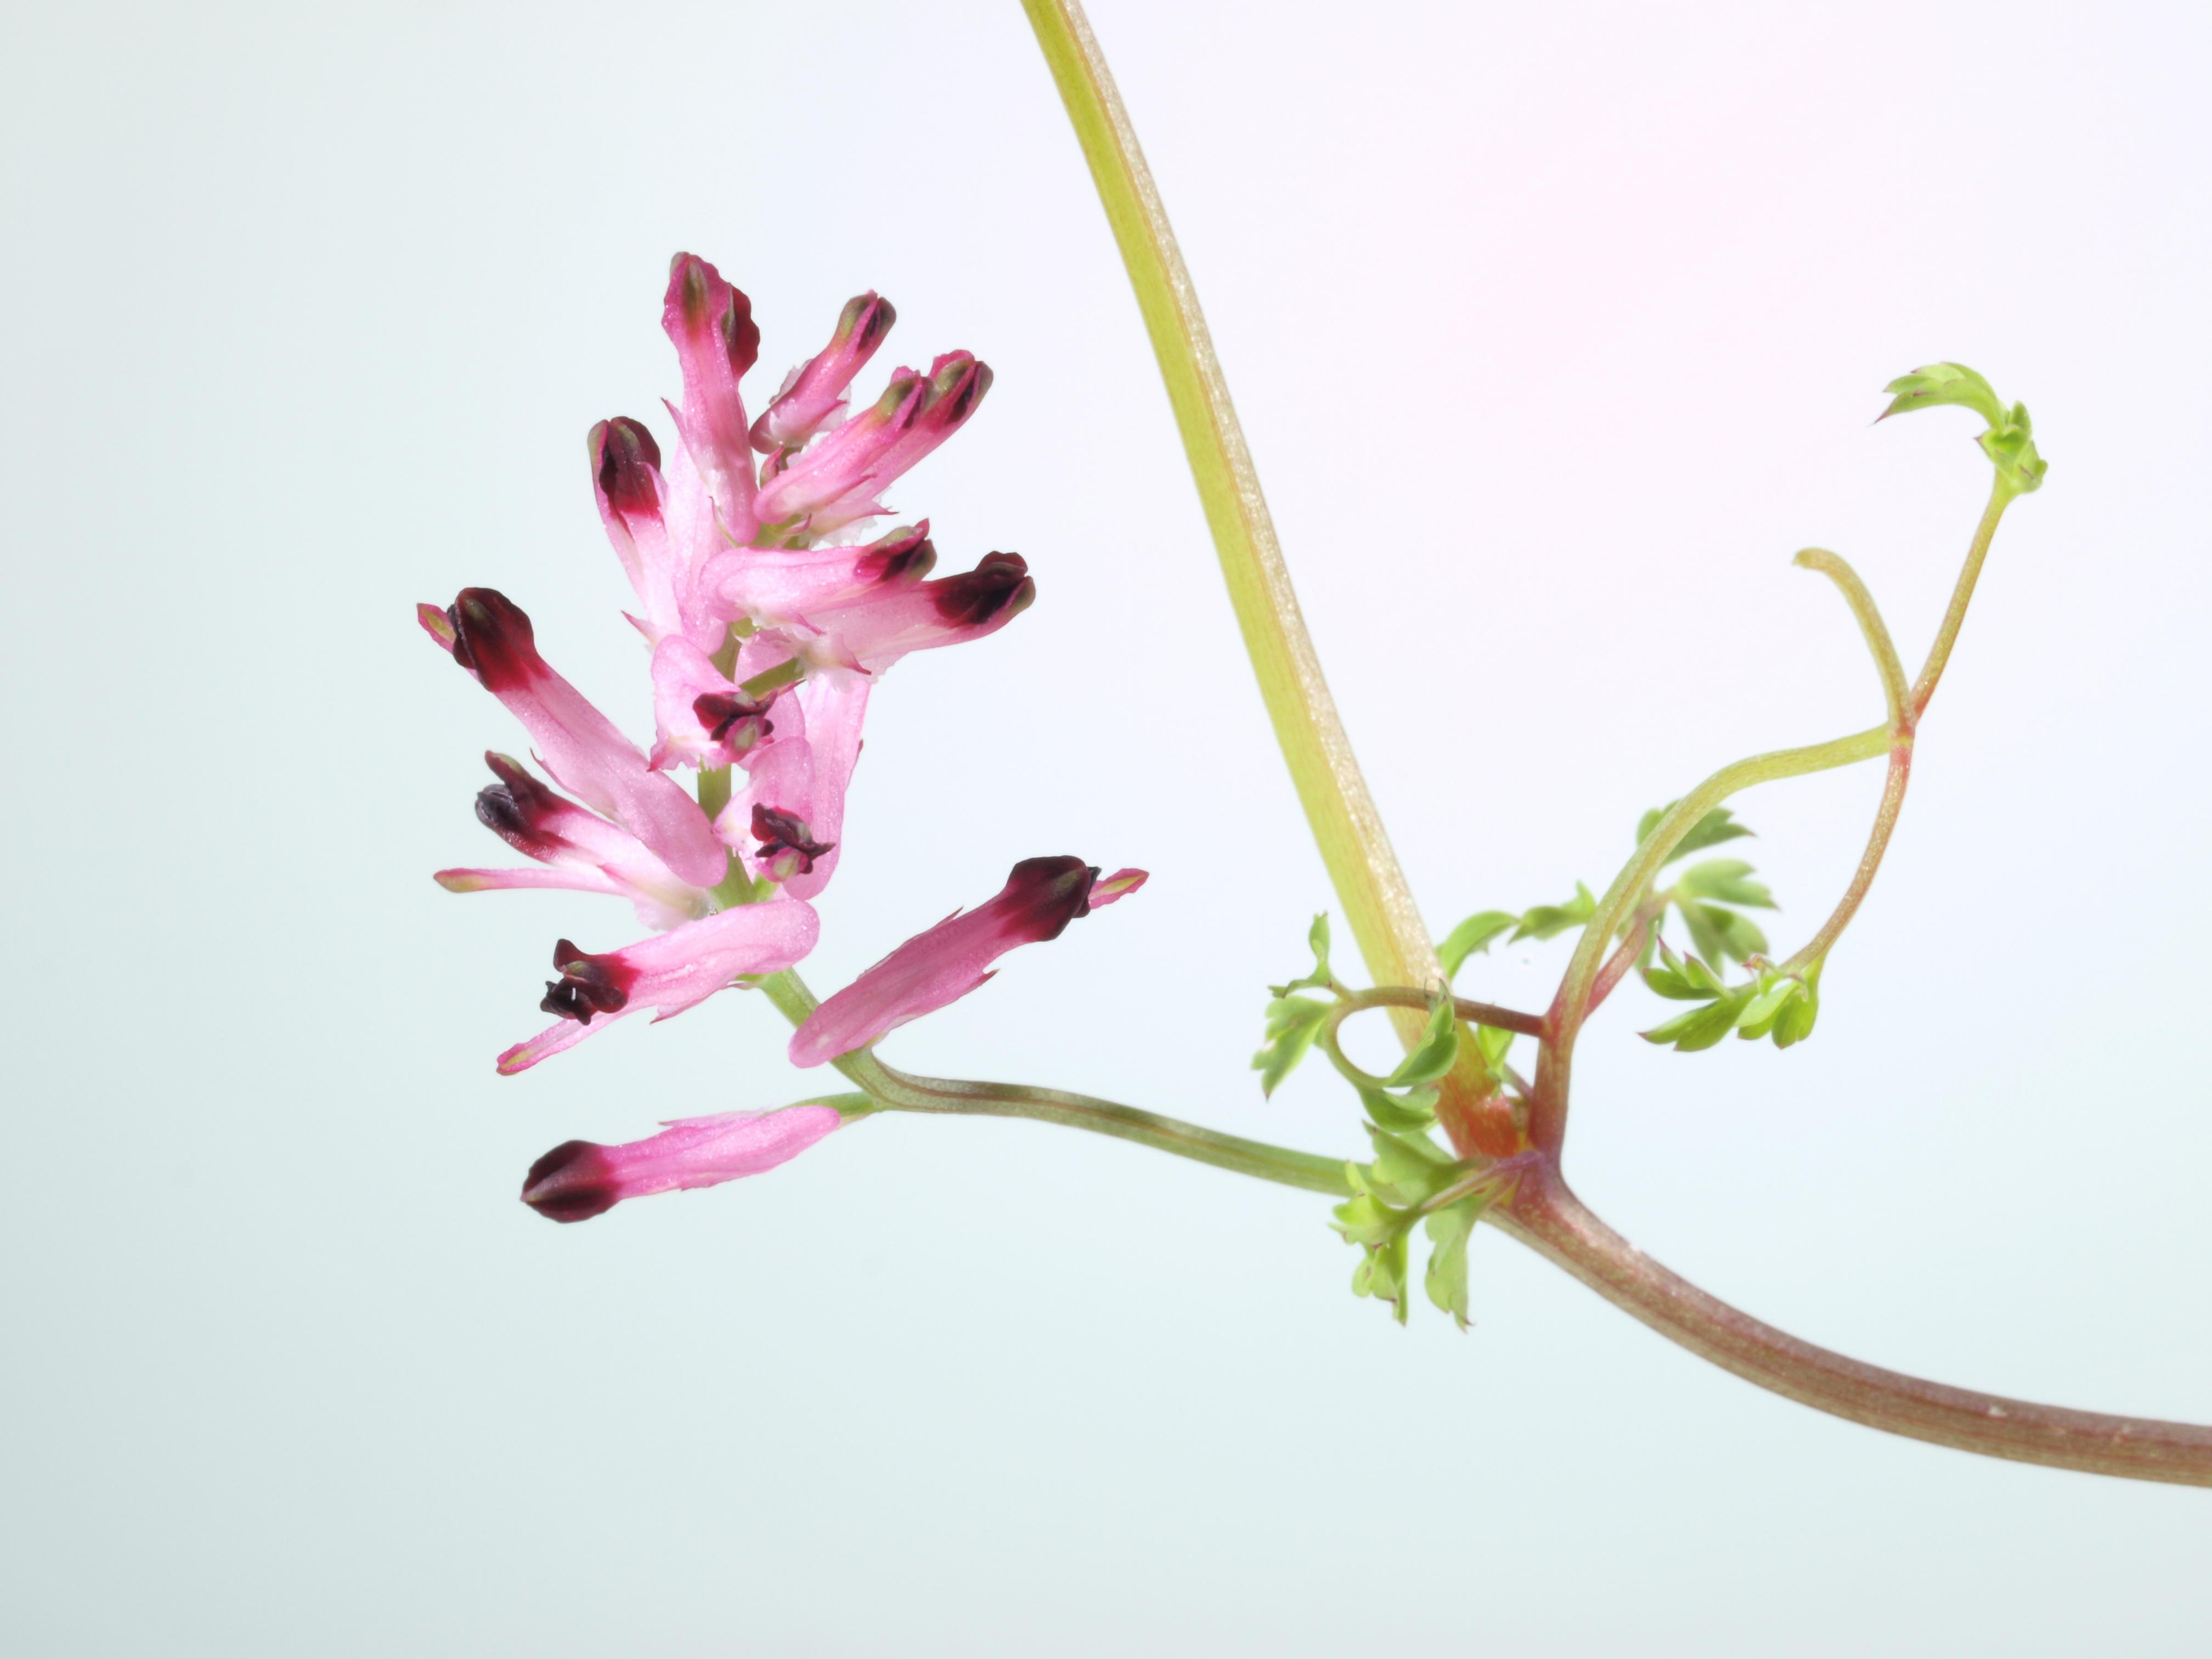 Mystery-flower-1-3.jpeg